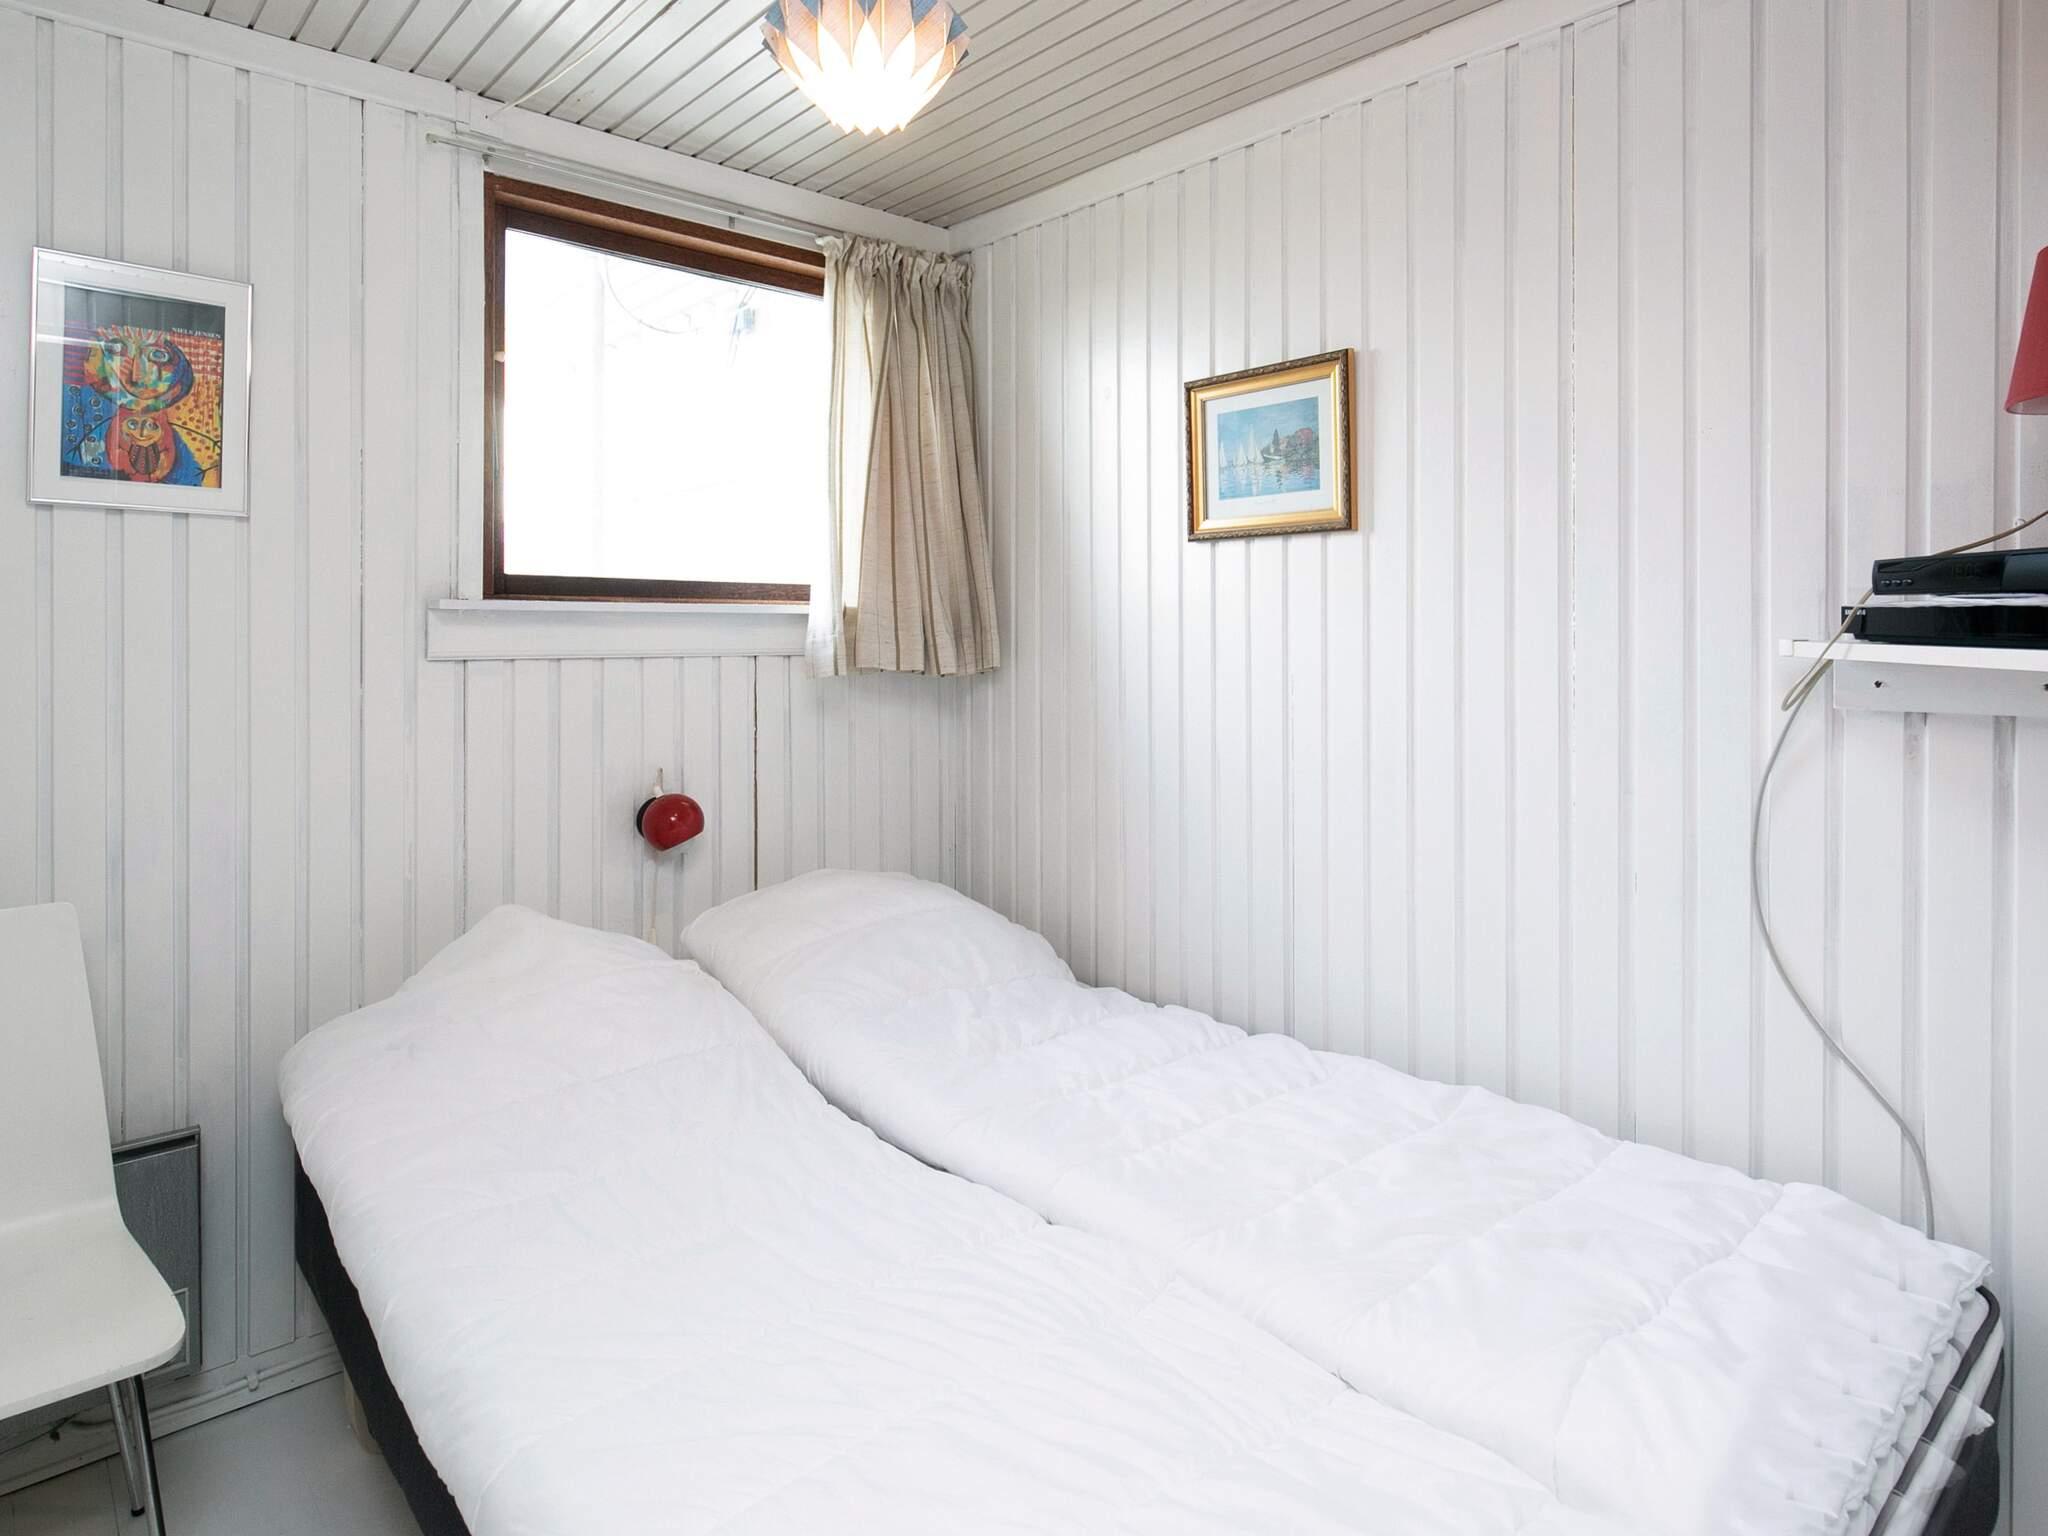 Ferienhaus Dyreborg (440378), Dyreborg, , Fünen, Dänemark, Bild 9